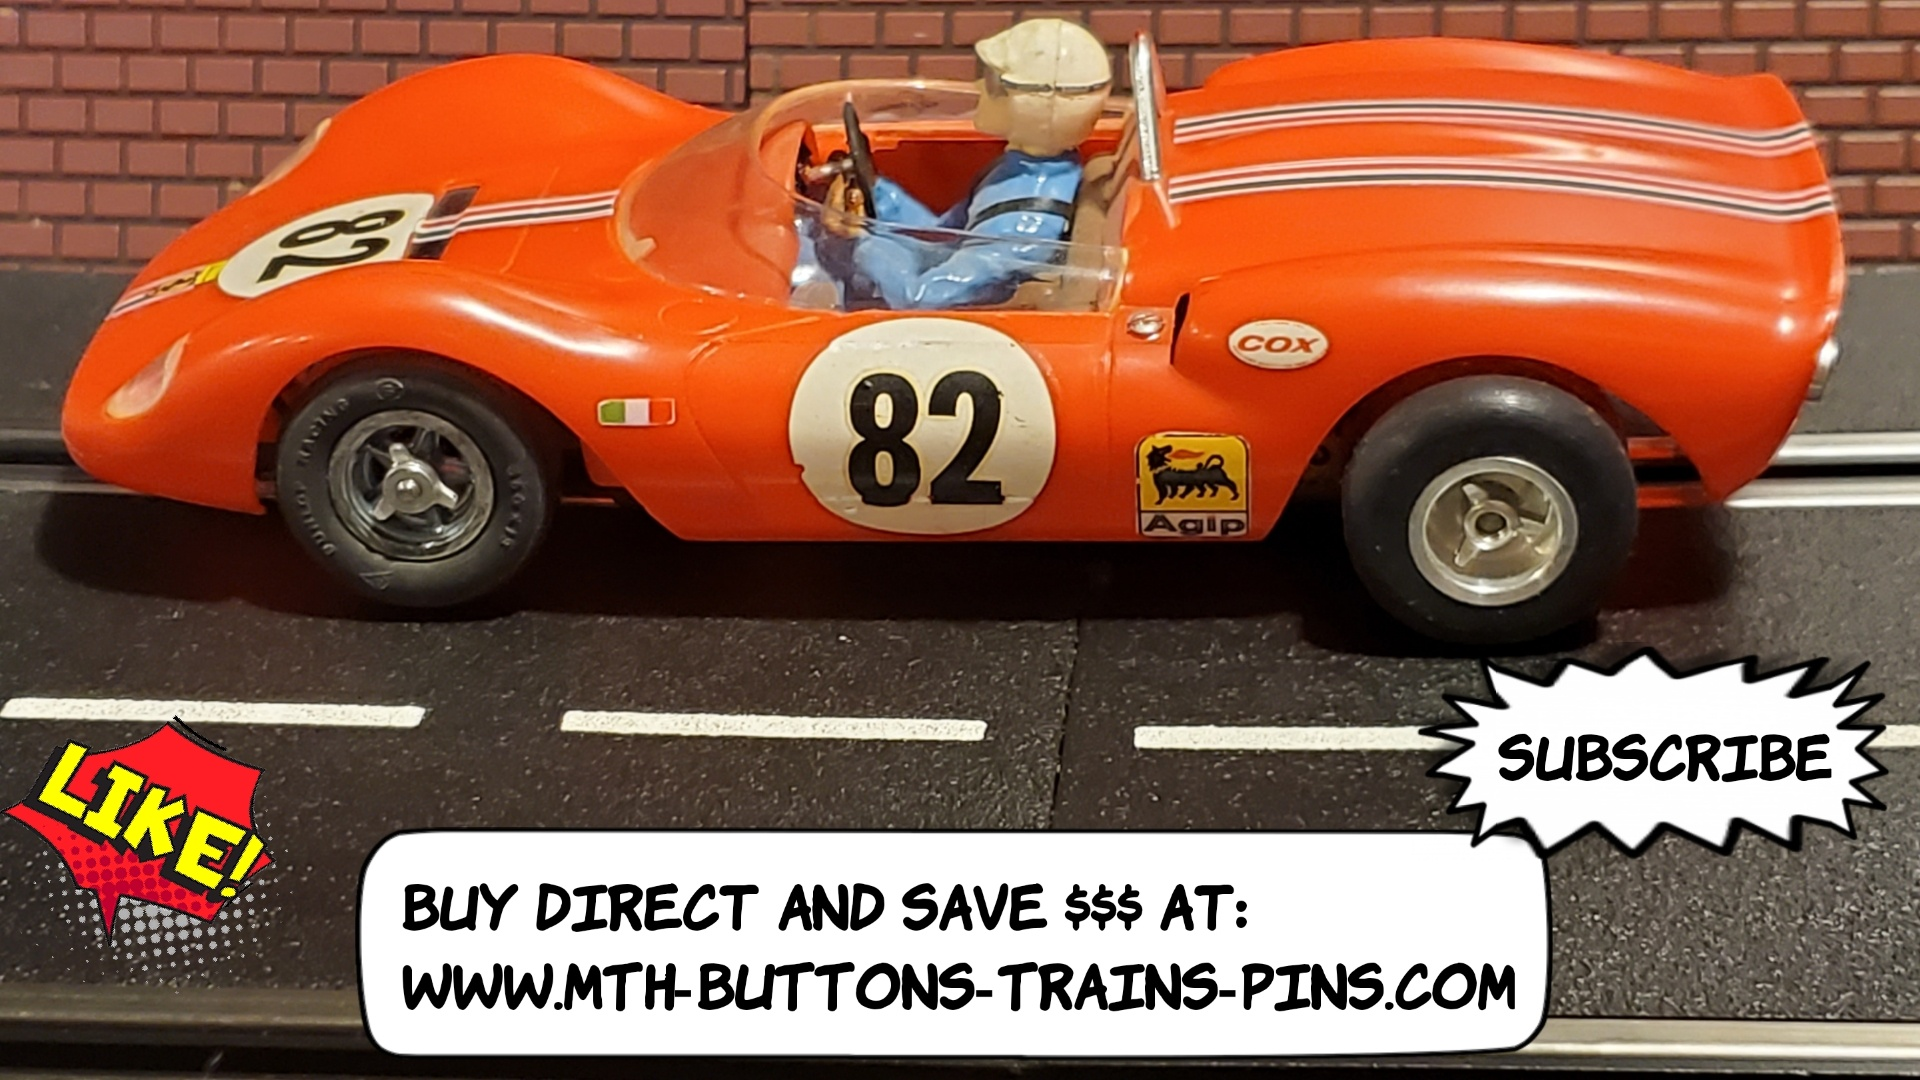 * VERY SPECIAL SALE PRICE * Ferrari Dino Spyder COX EXTREMELY RARE Original 1:24 Scale – Car #82